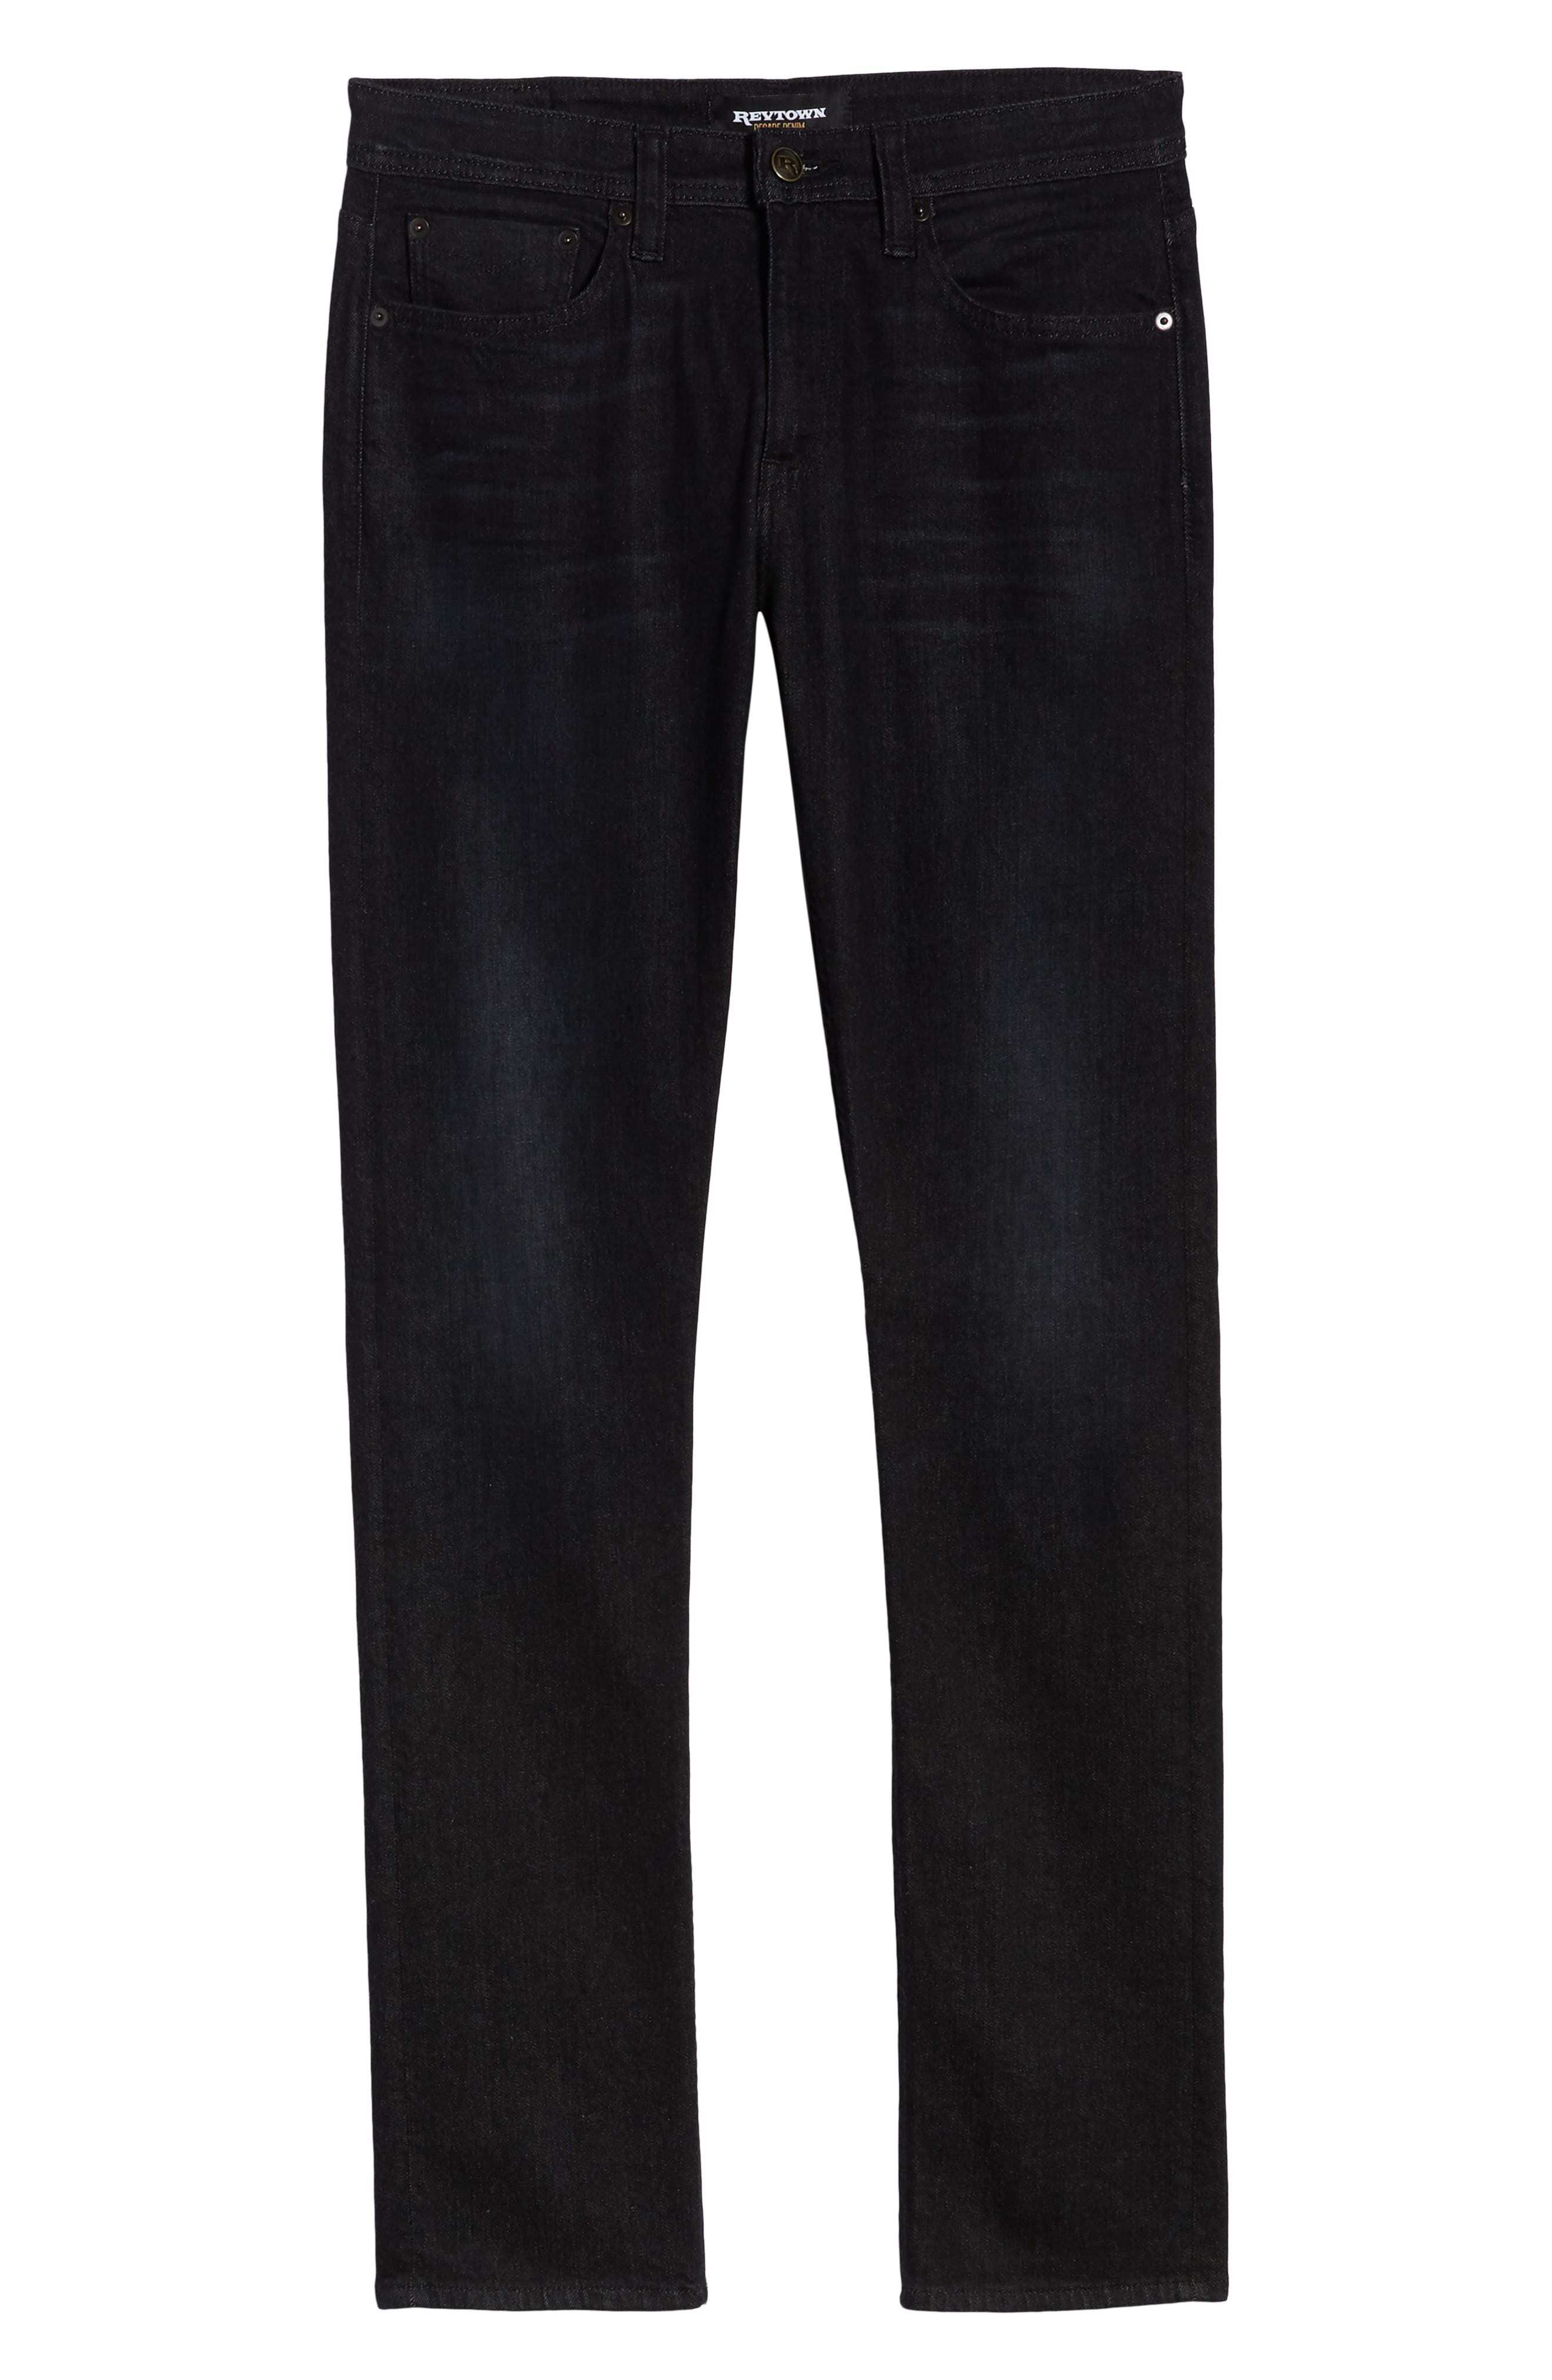 REVTOWN,                             Sharp Slim Fit Jeans,                             Alternate thumbnail 6, color,                             COAL BLACK